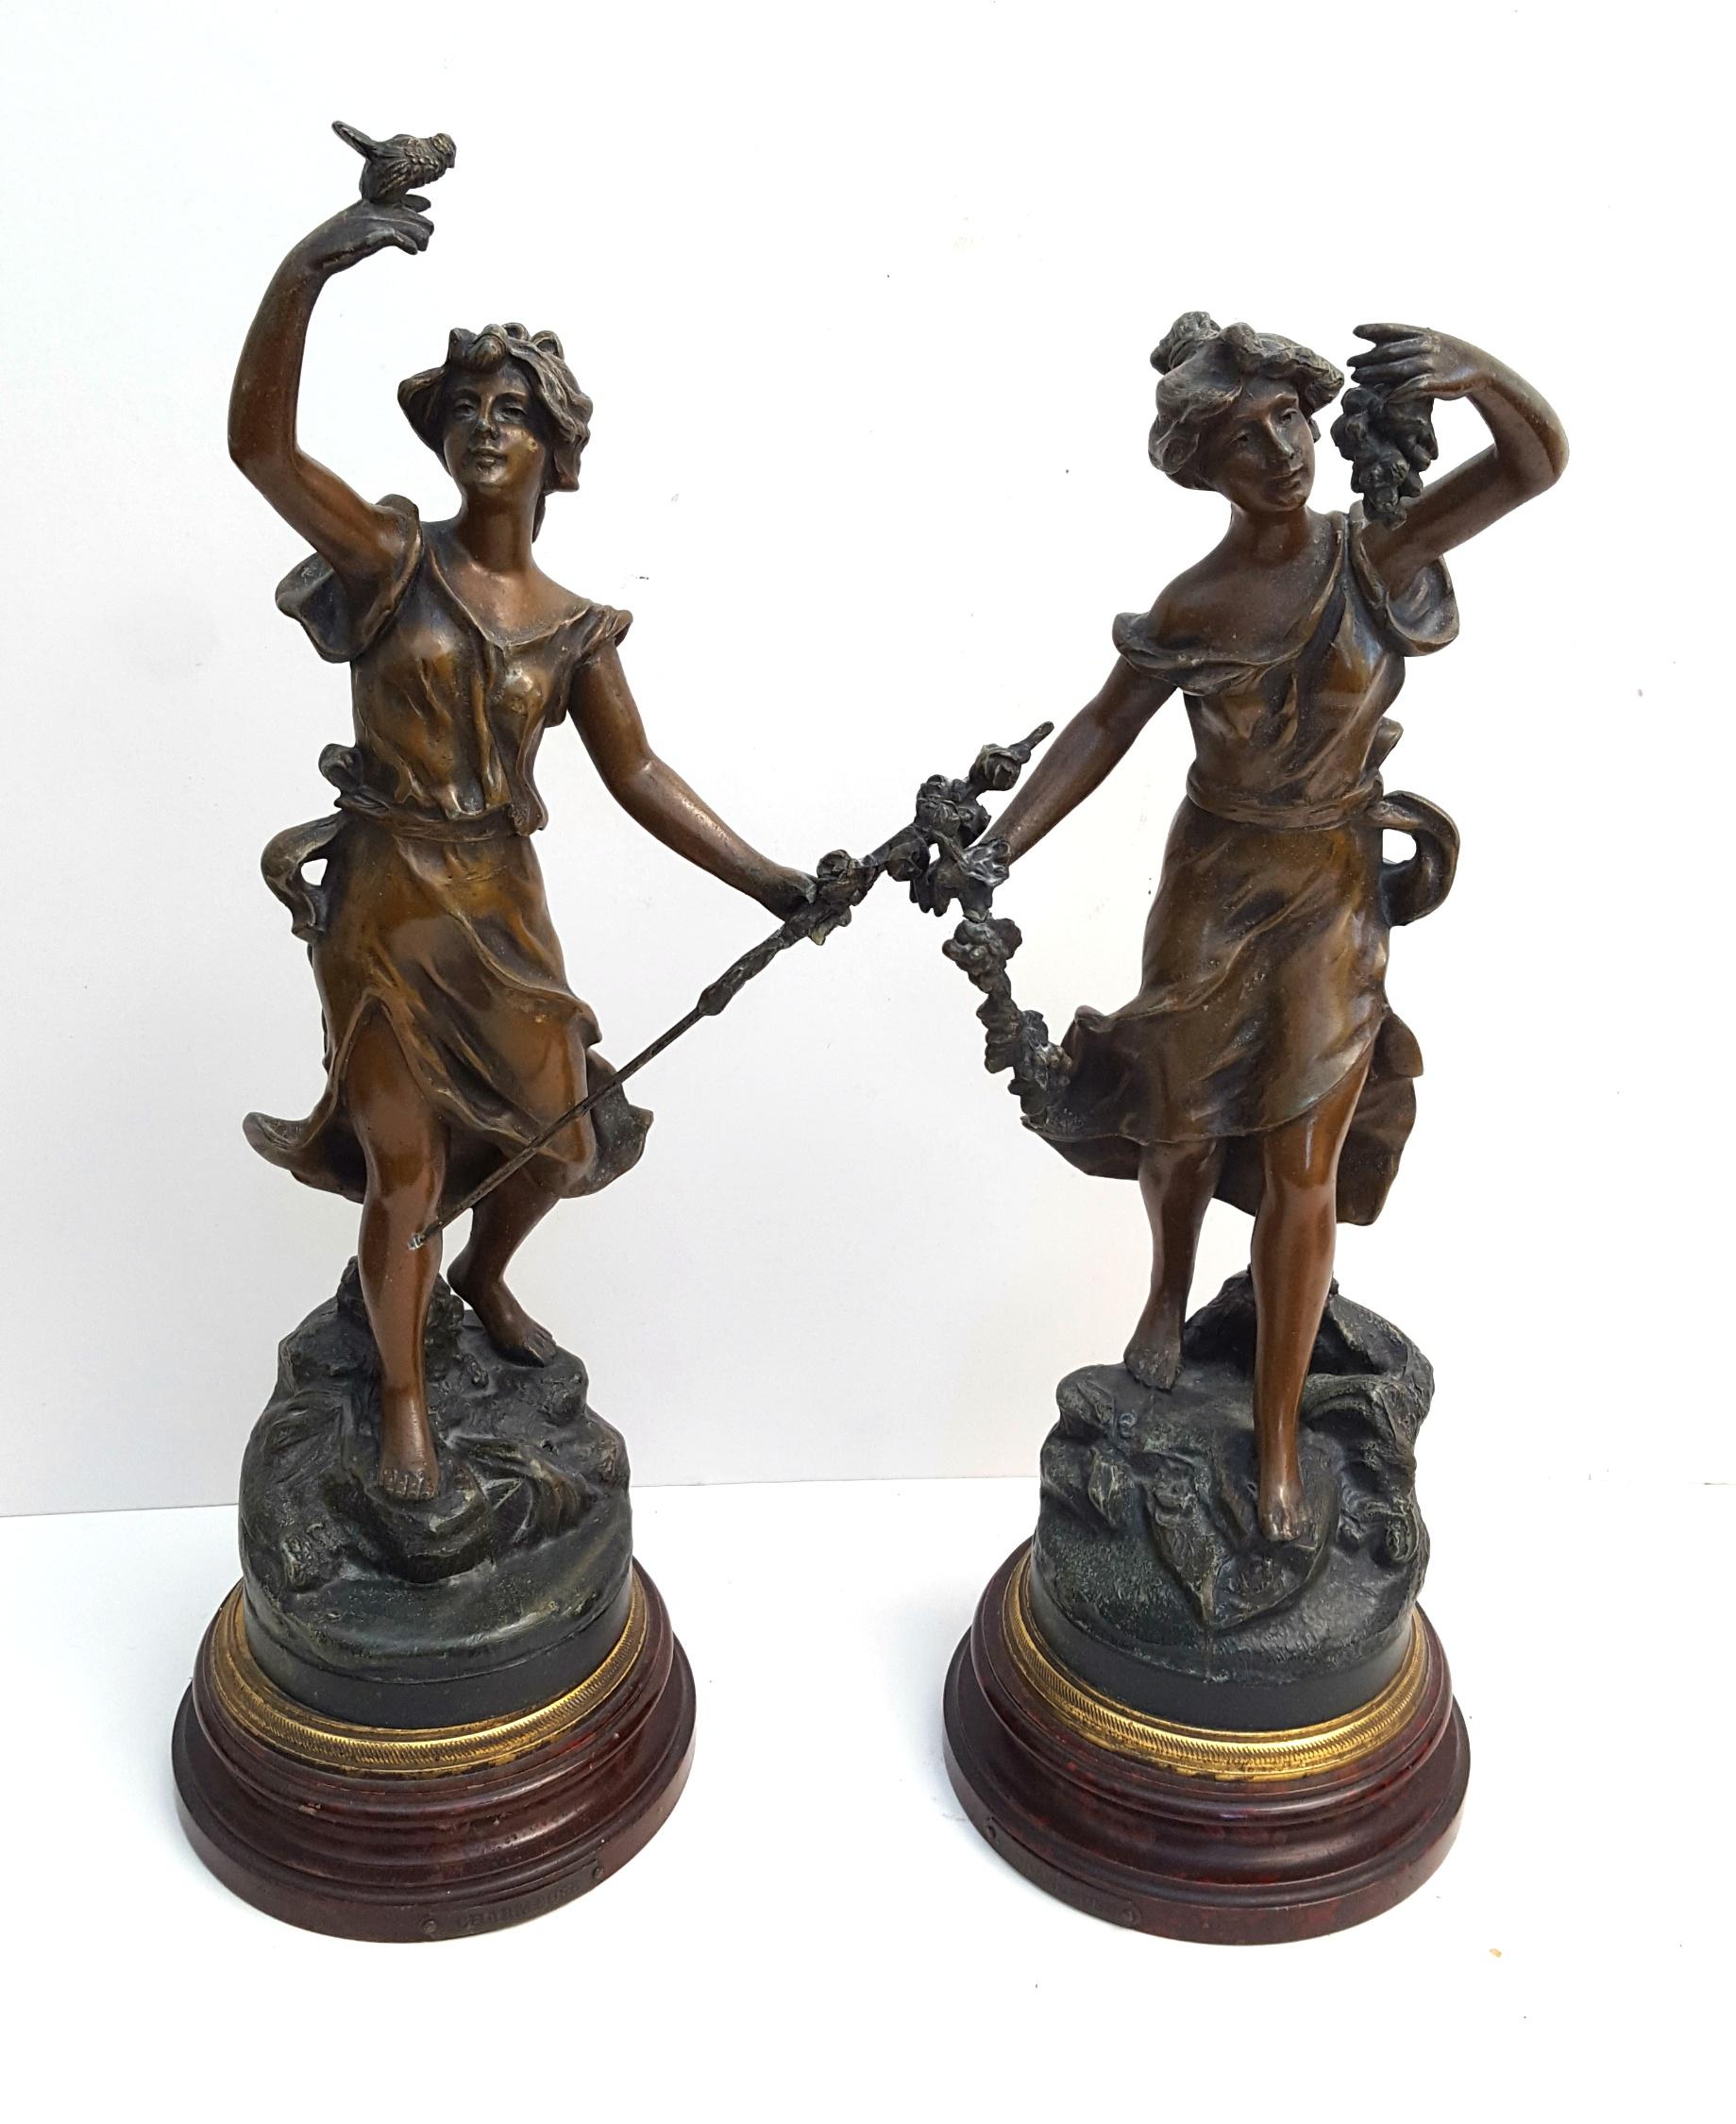 Antique 2 x Spelter Figures on Wood Plinths